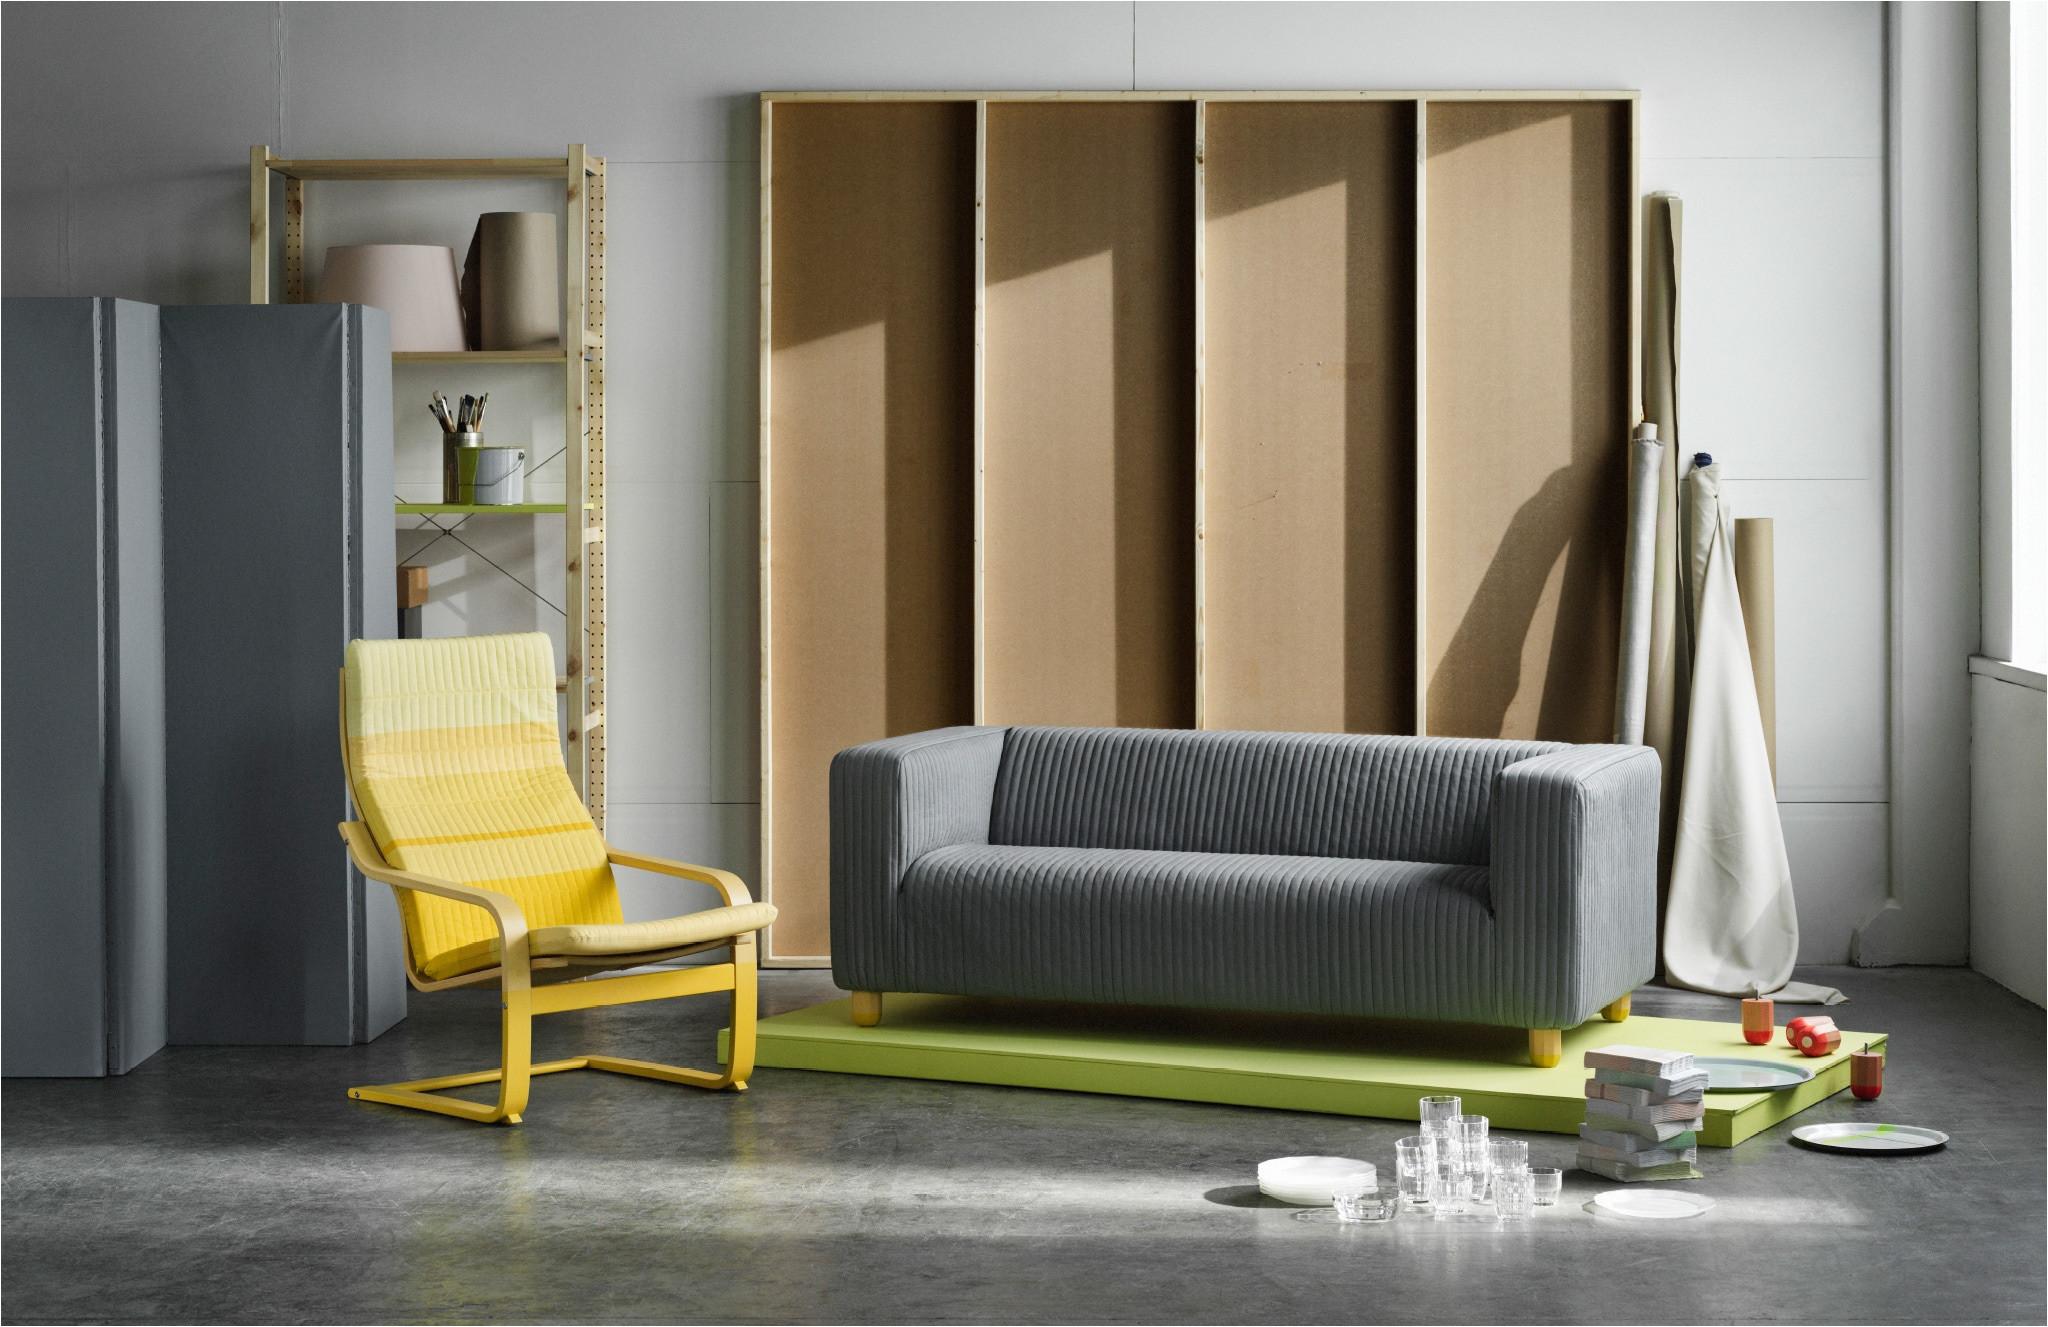 new at ikea the lyskraft collection a series of klippan sofas poa ng armchairs